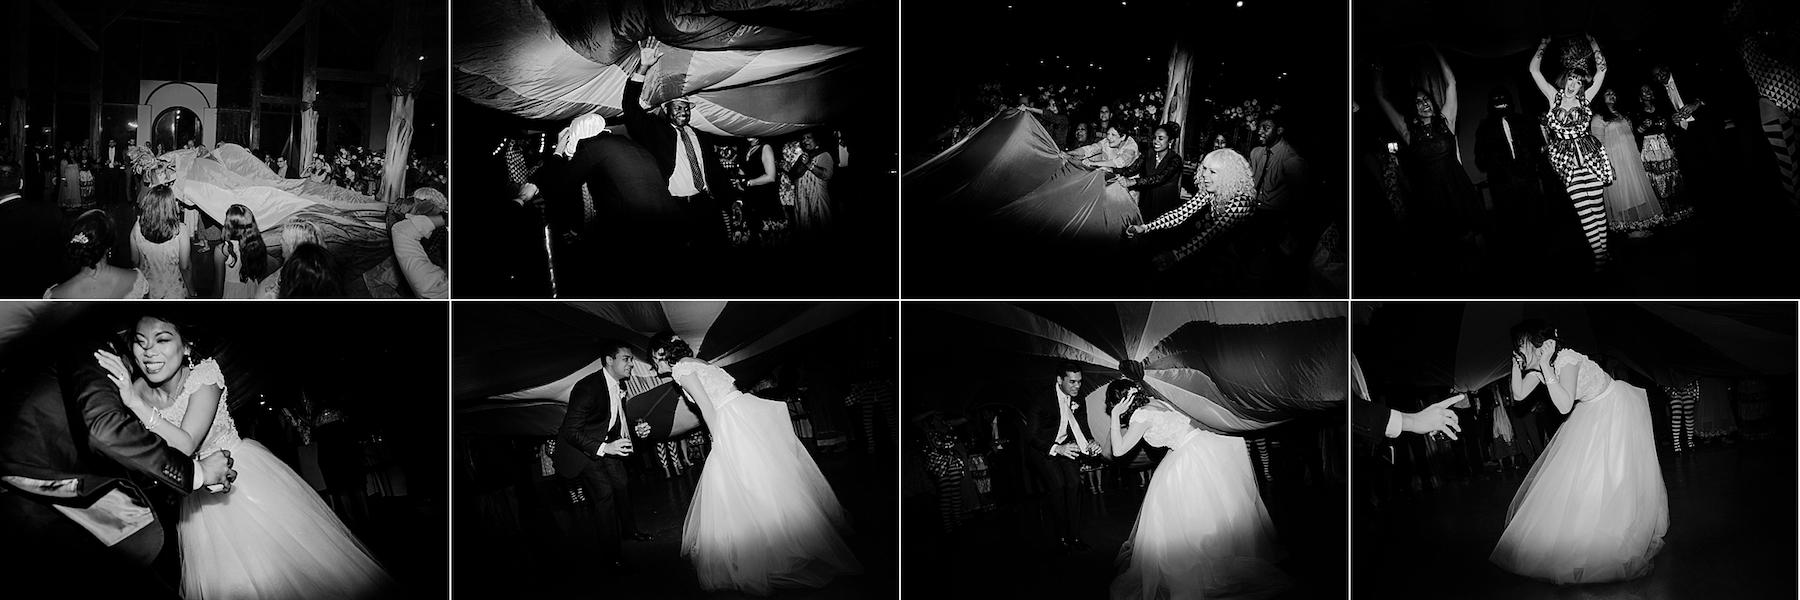 barr-mansion-wedding-austin-texas8910.JPG